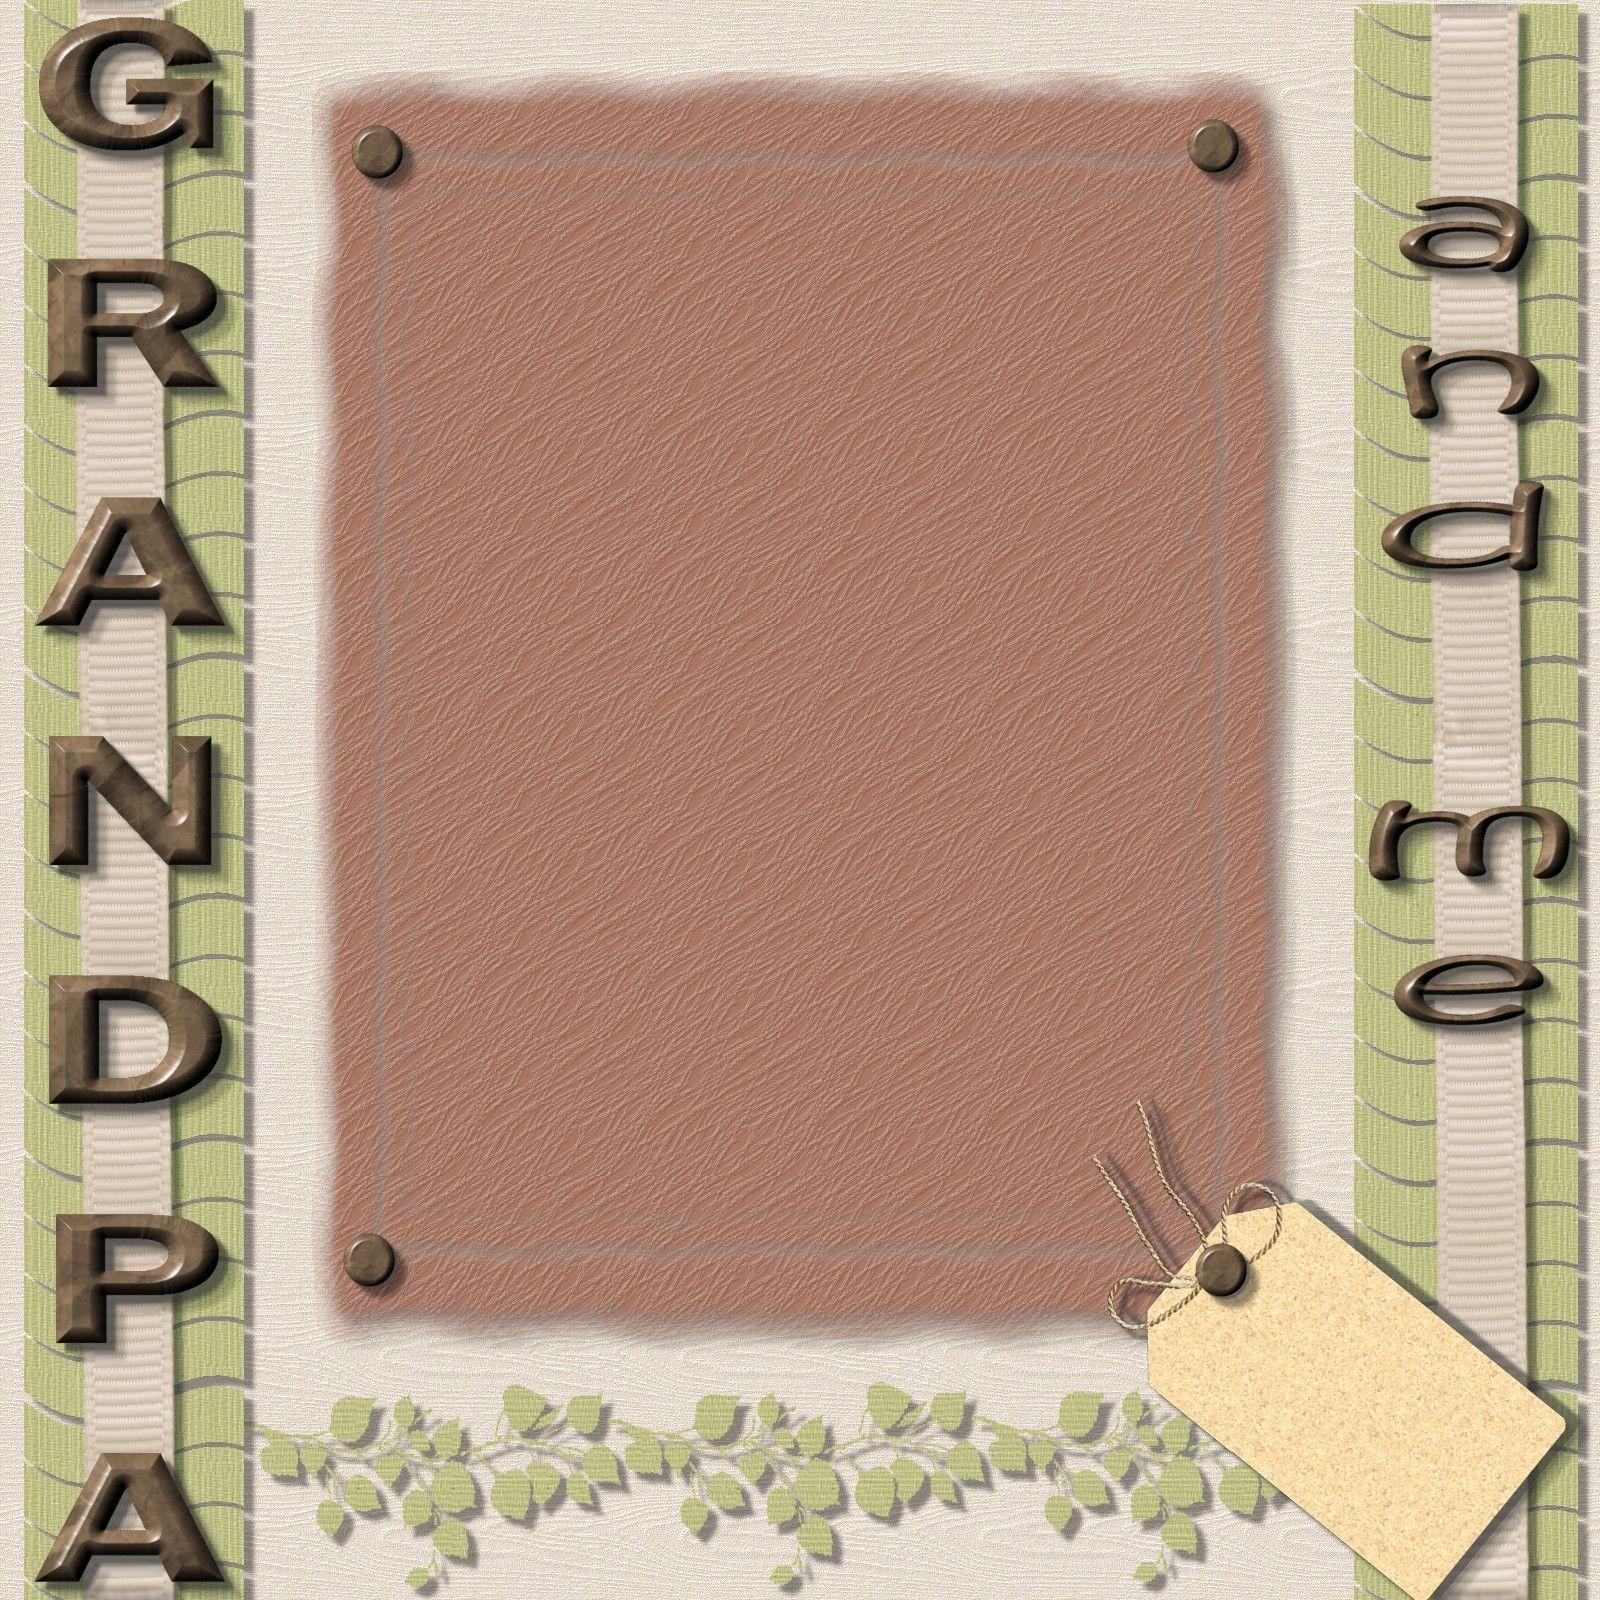 Scrapbook ideas about me - Grandma Grandpa With Baby Scrapbook Page Ideas Angelwithin S Scrapbooks Grandpa